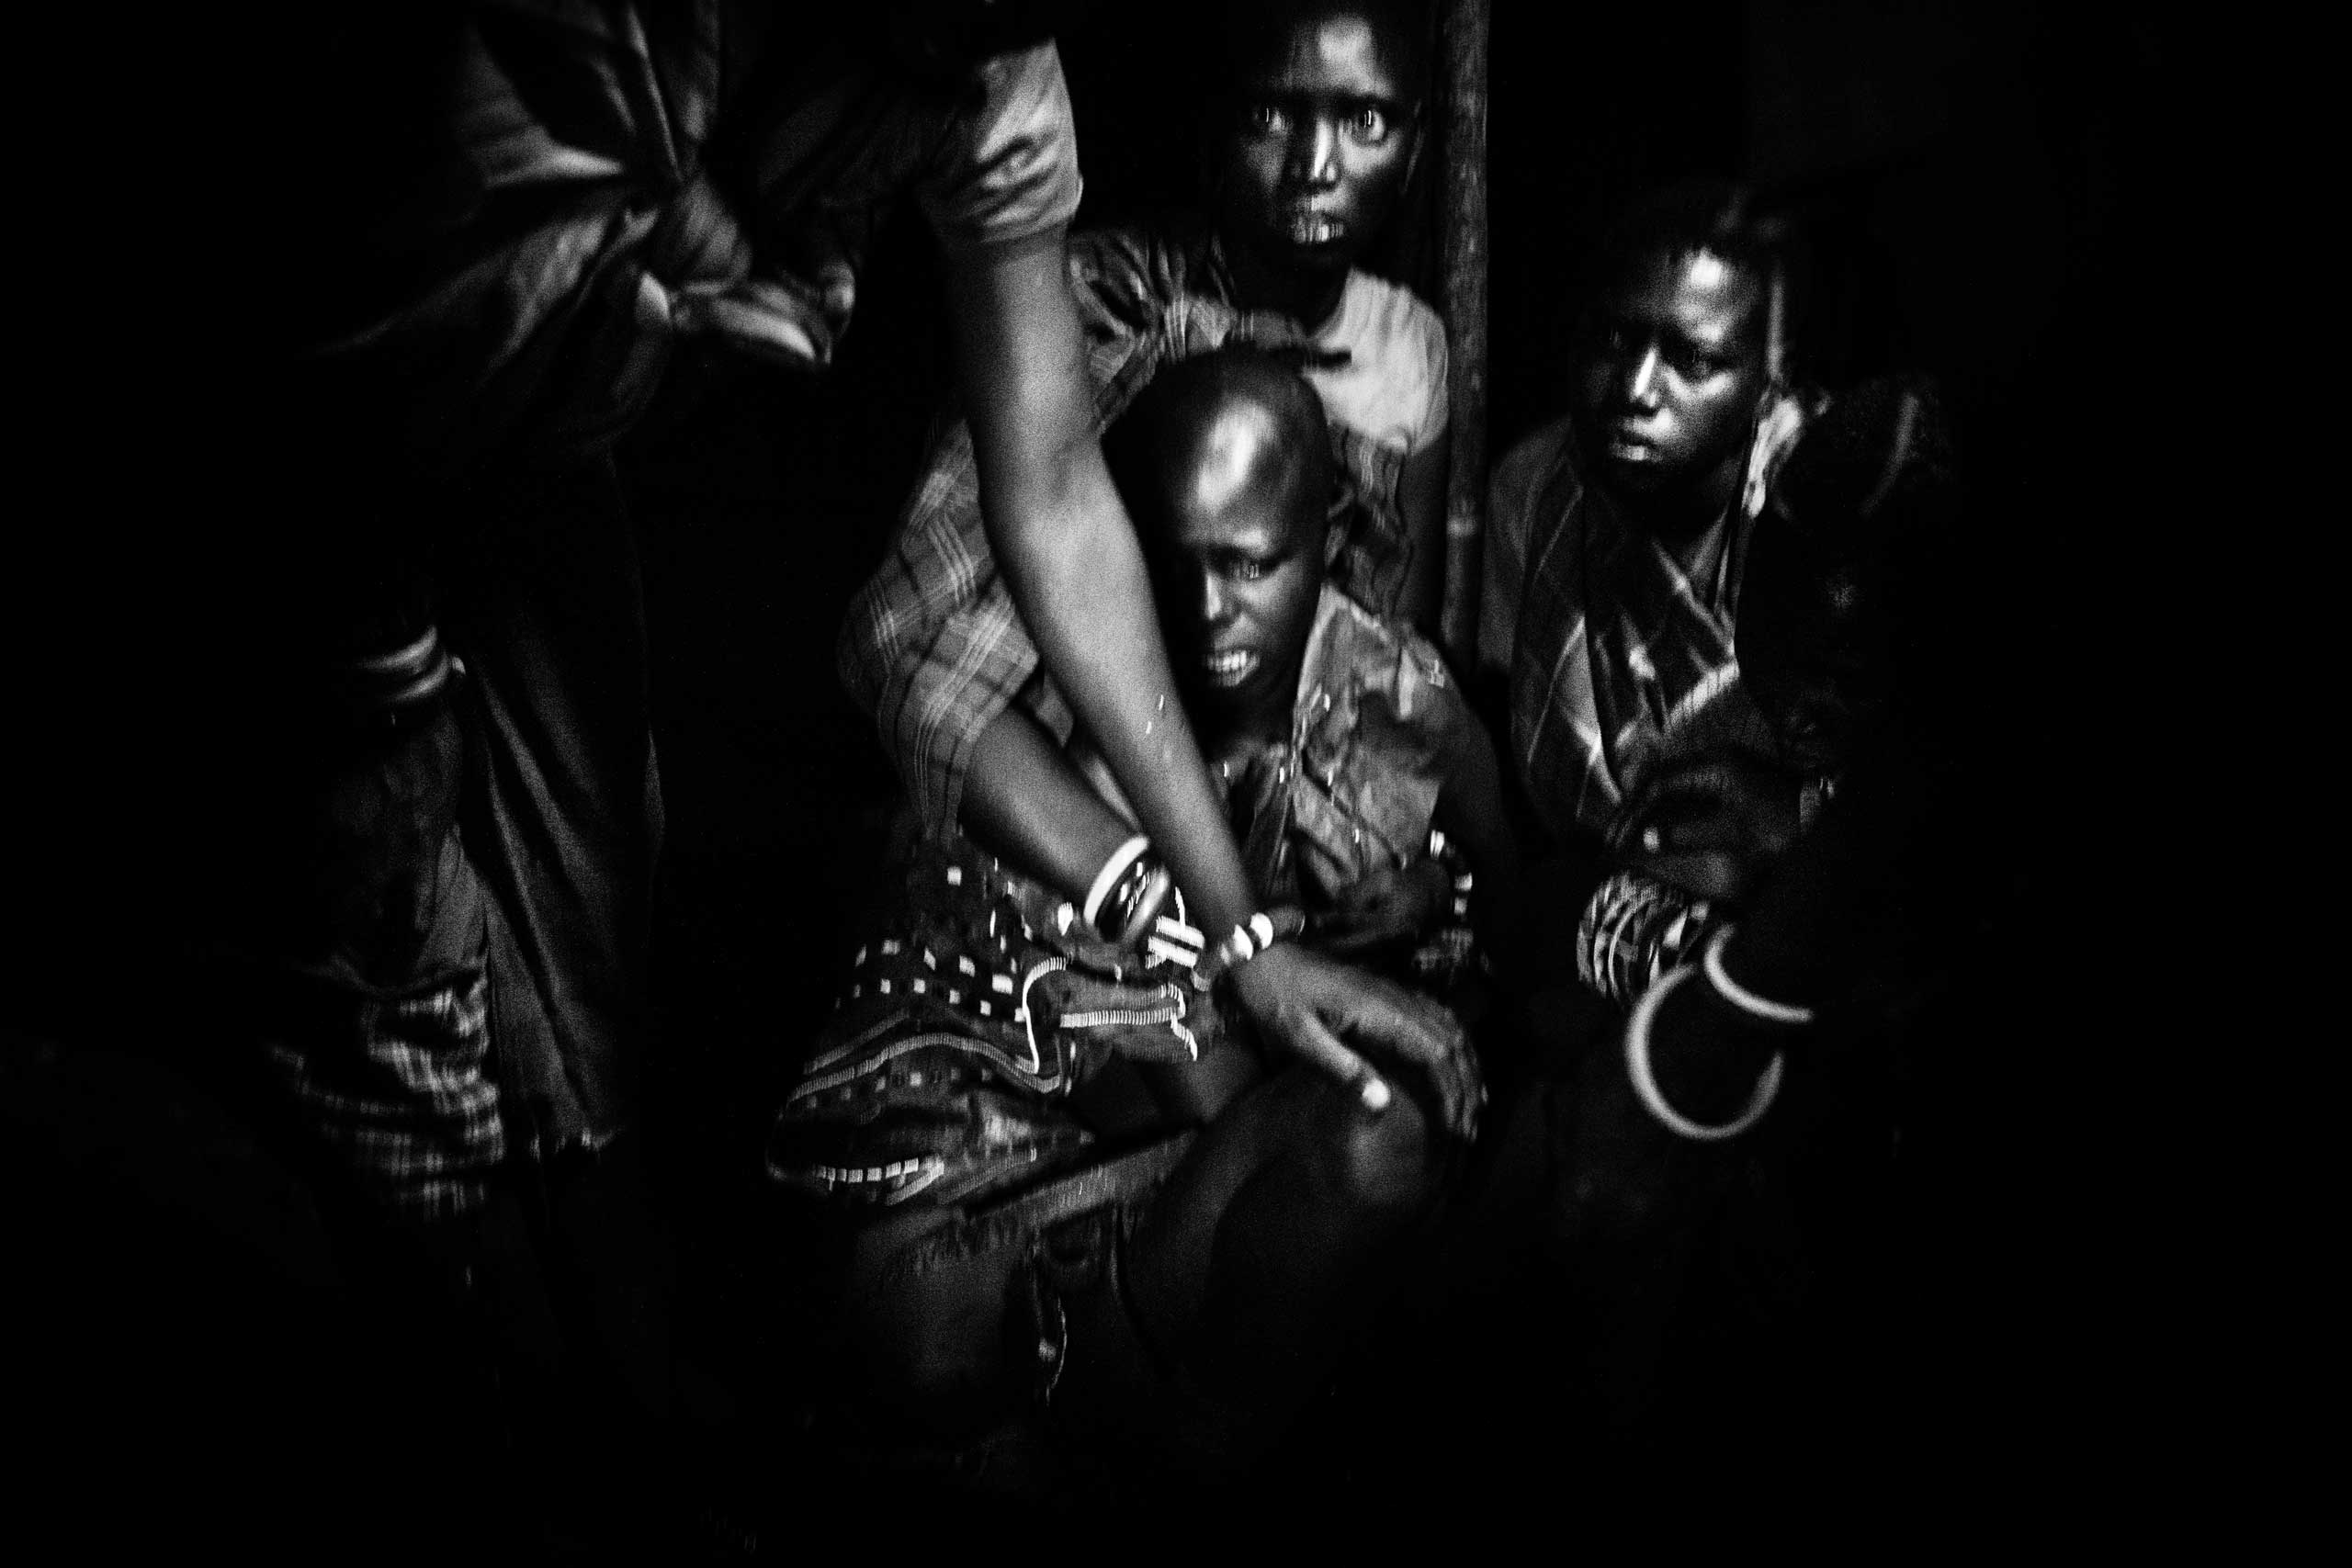 Nasirian cries at the start of the circumcision.